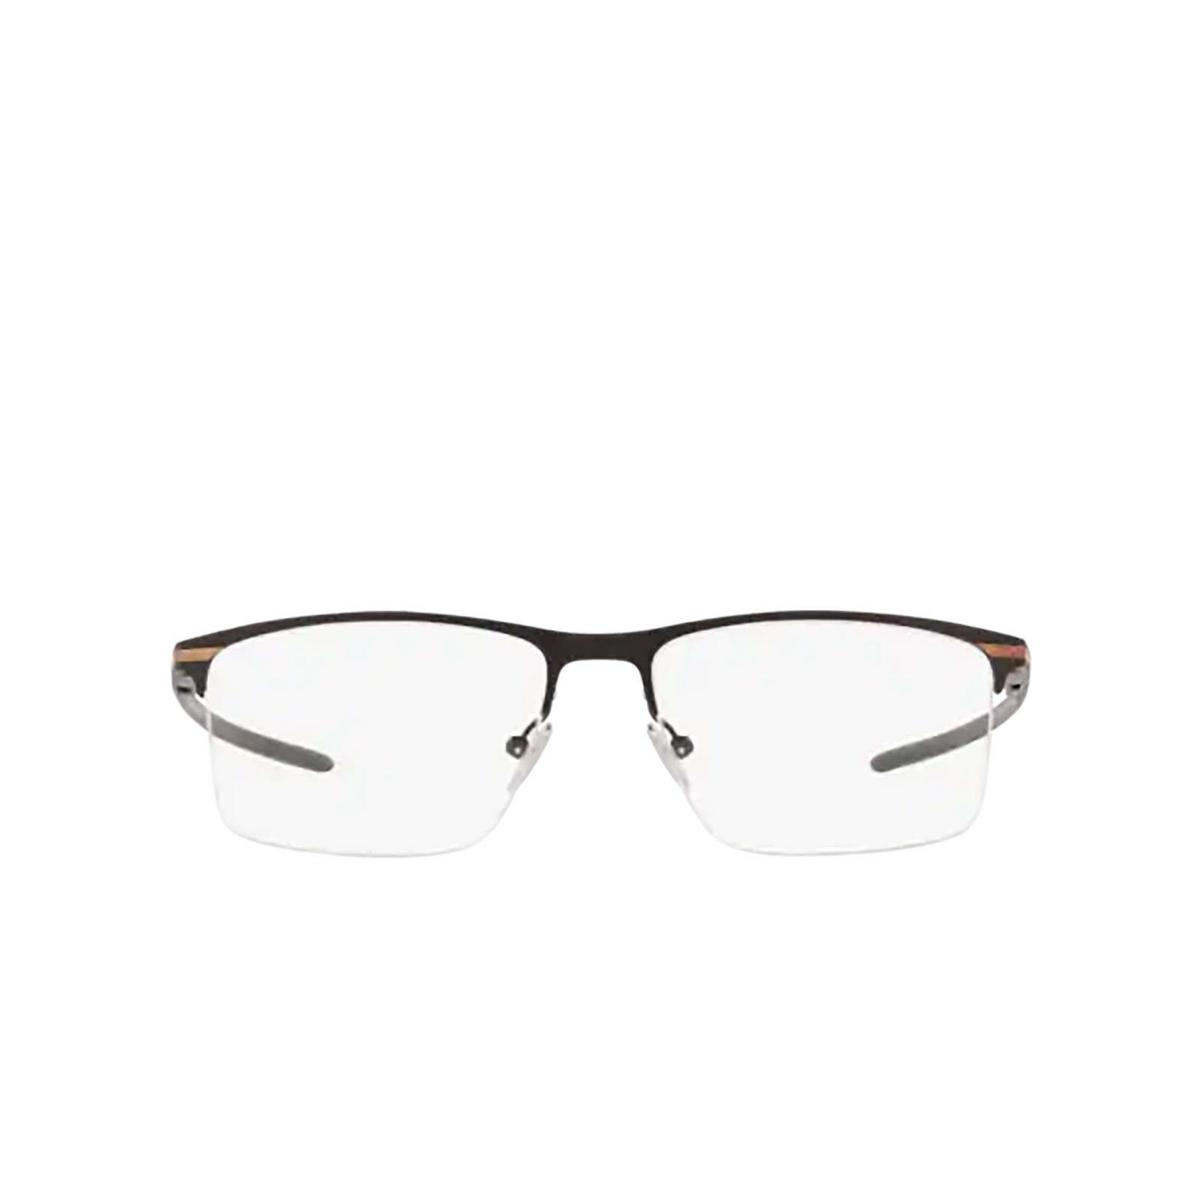 Oakley® Rectangle Eyeglasses: Tie Bar 0.5 OX5140 color Satin Black 514001 - front view.